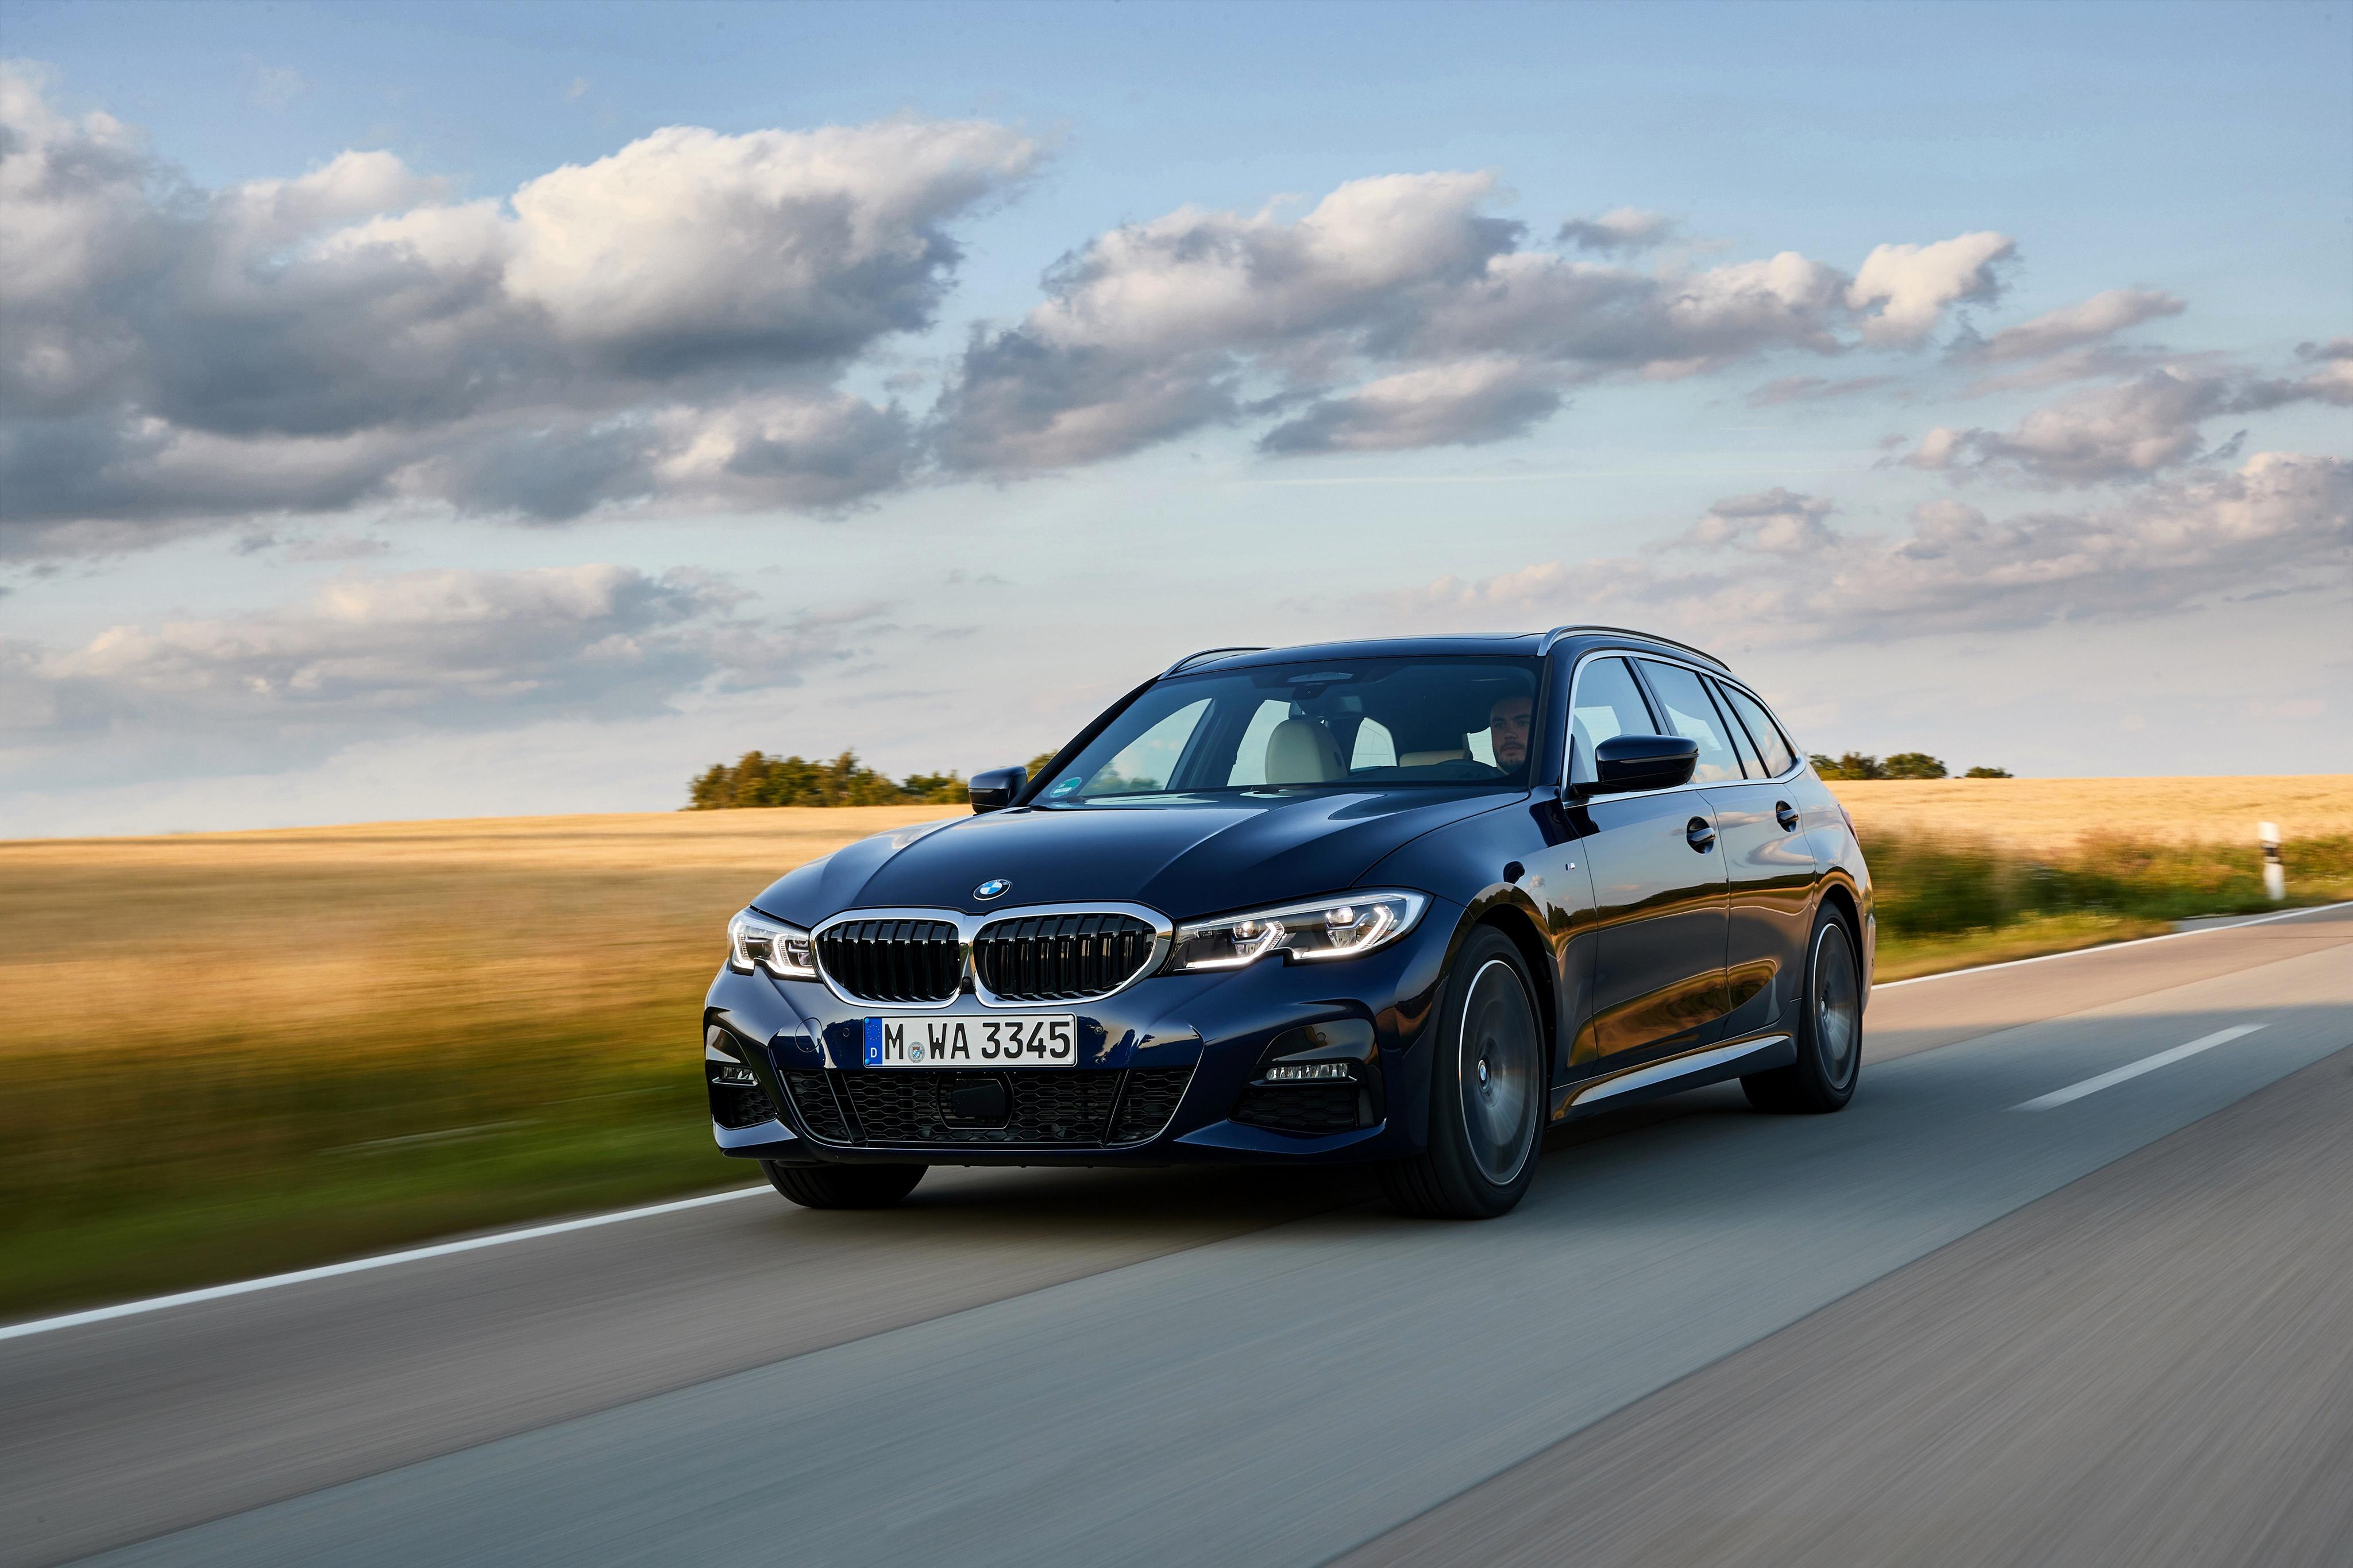 BMW 3 Series Touring 4k Ultra HD Wallpaper   Background ...